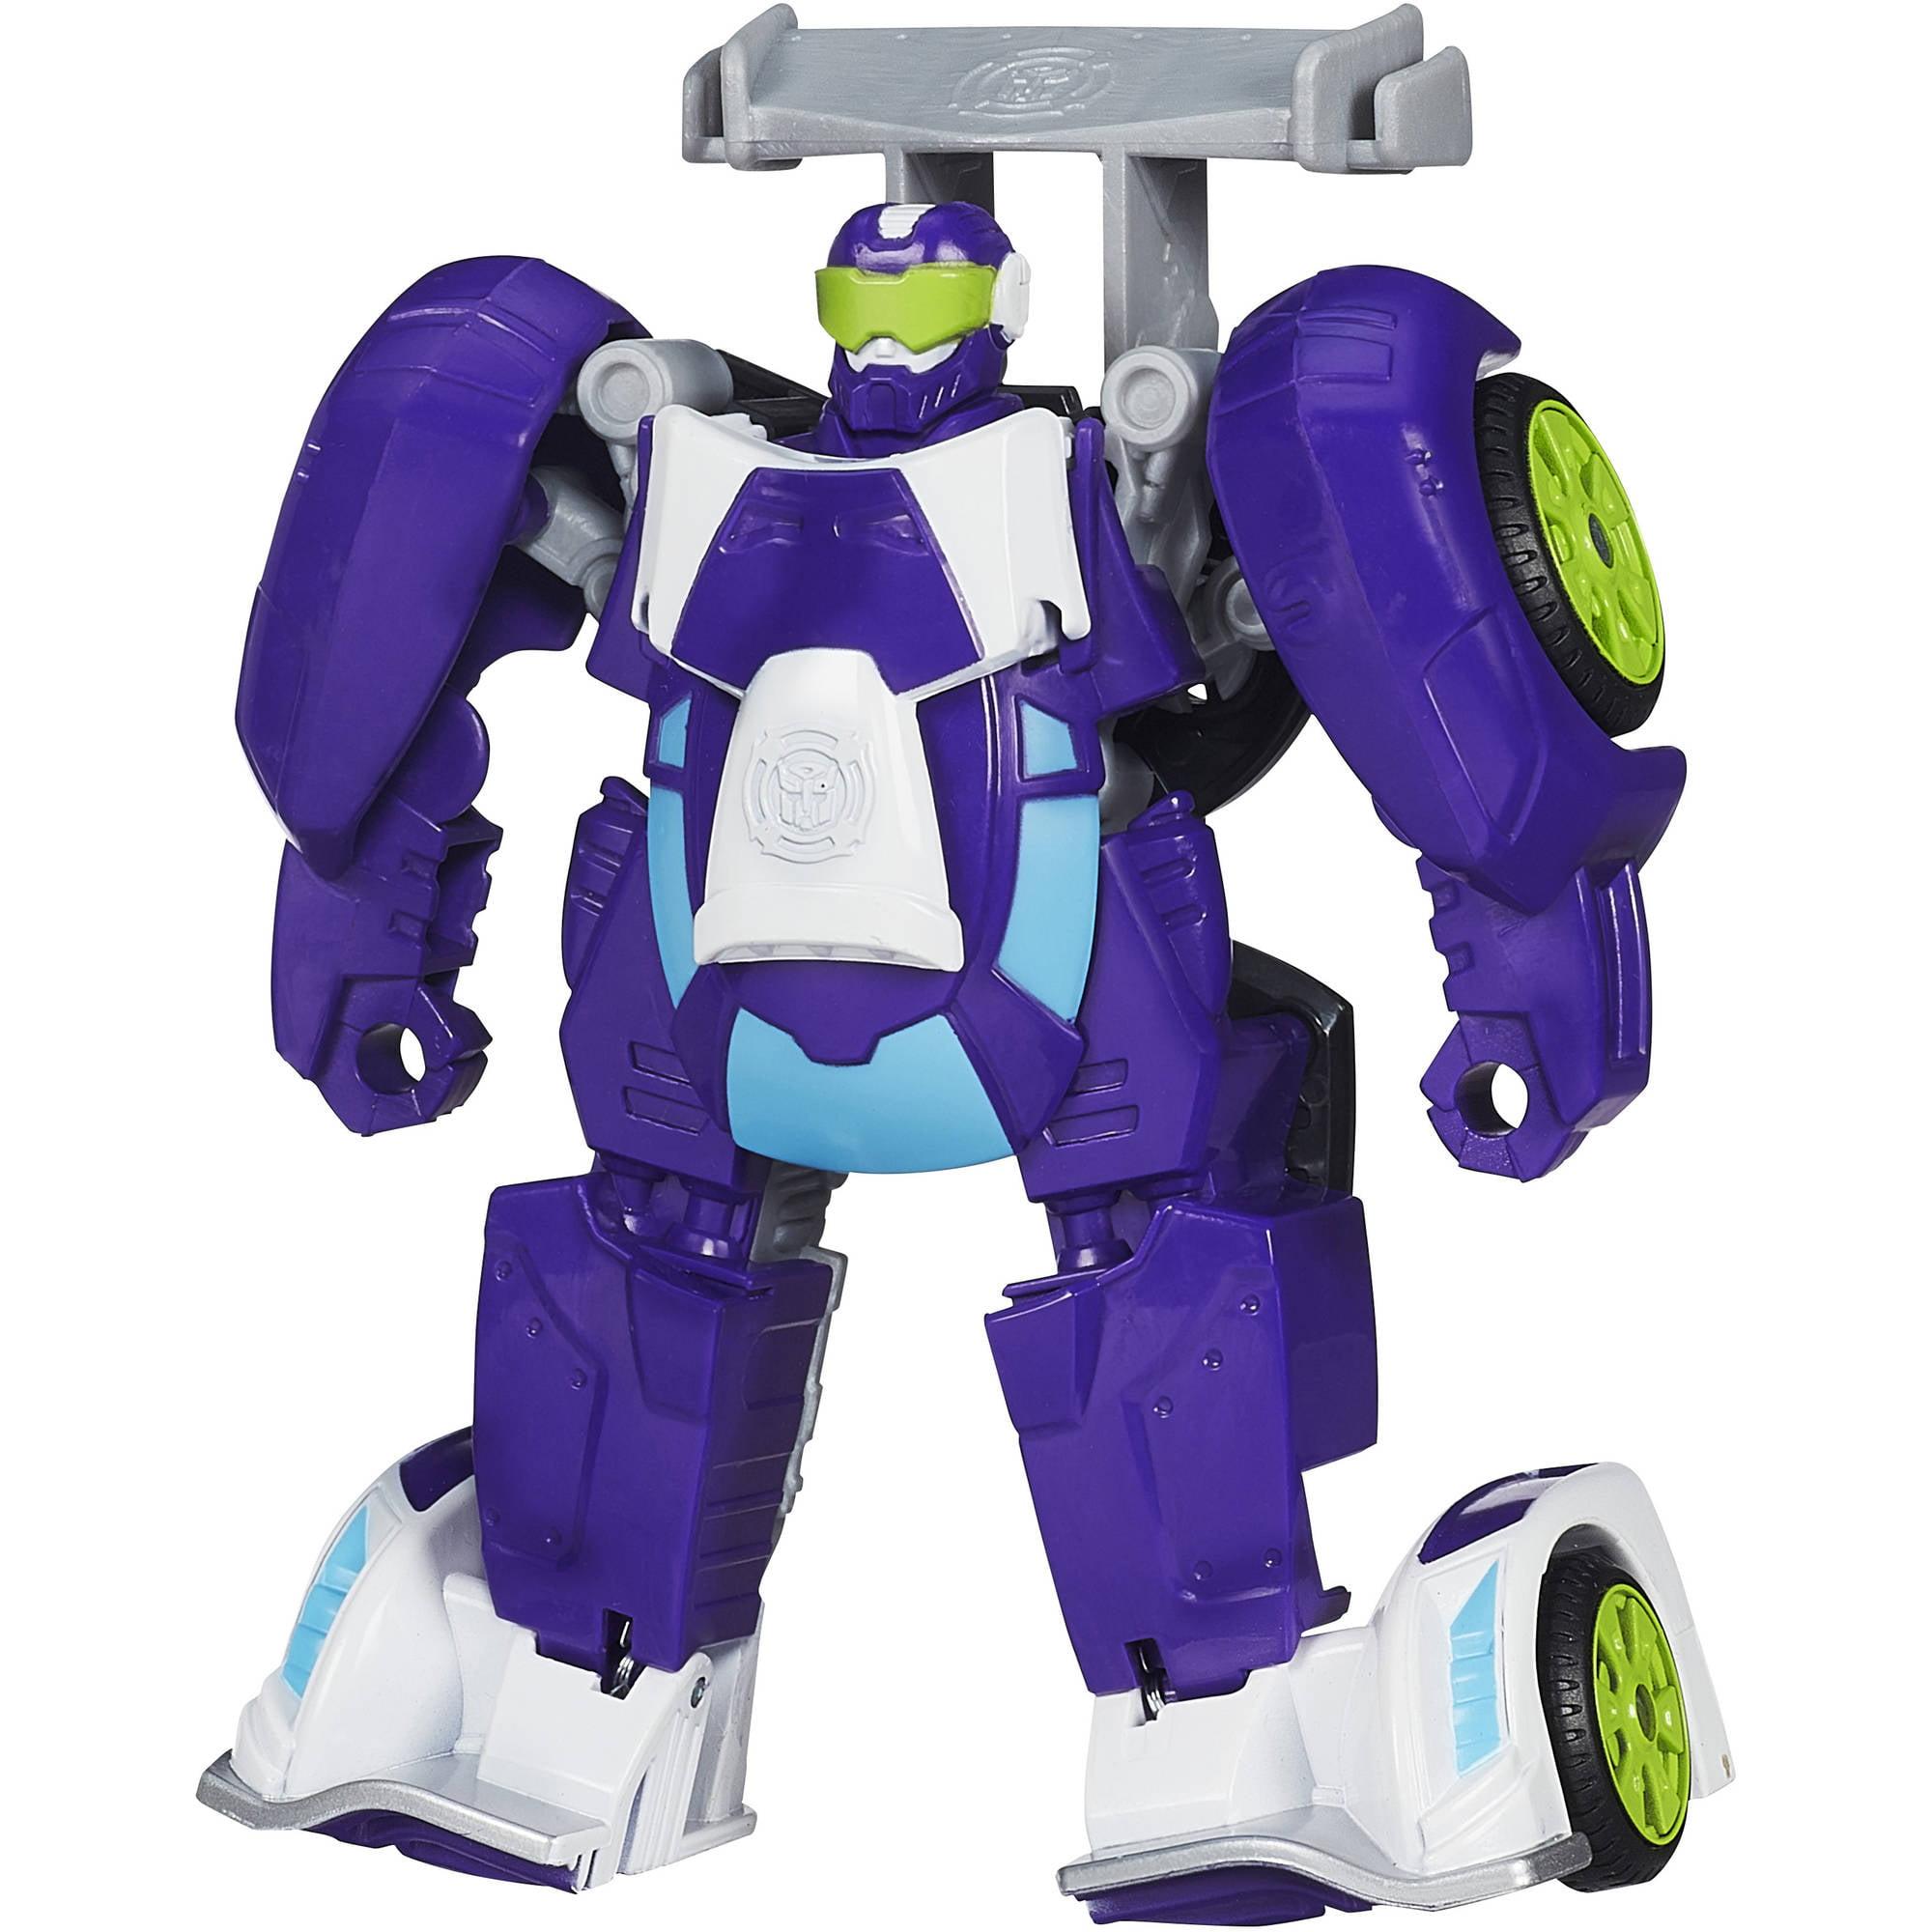 Playskool Heroes Transformers Rescue Bots Blurr by Hasbro